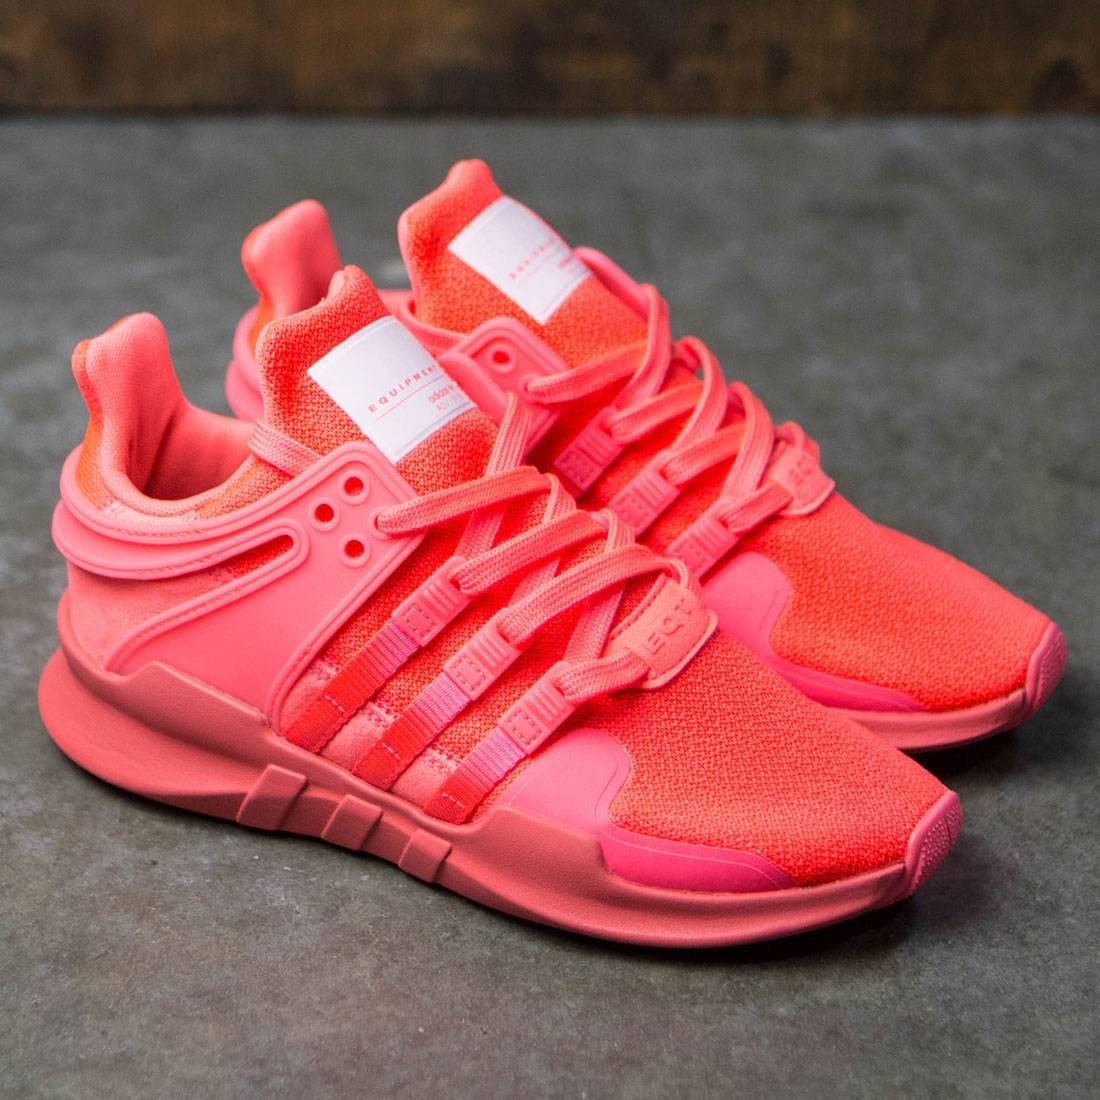 0325ba118 Женские кроссовки Adidas Women EQT Support ADV Red: продажа, цена в ...